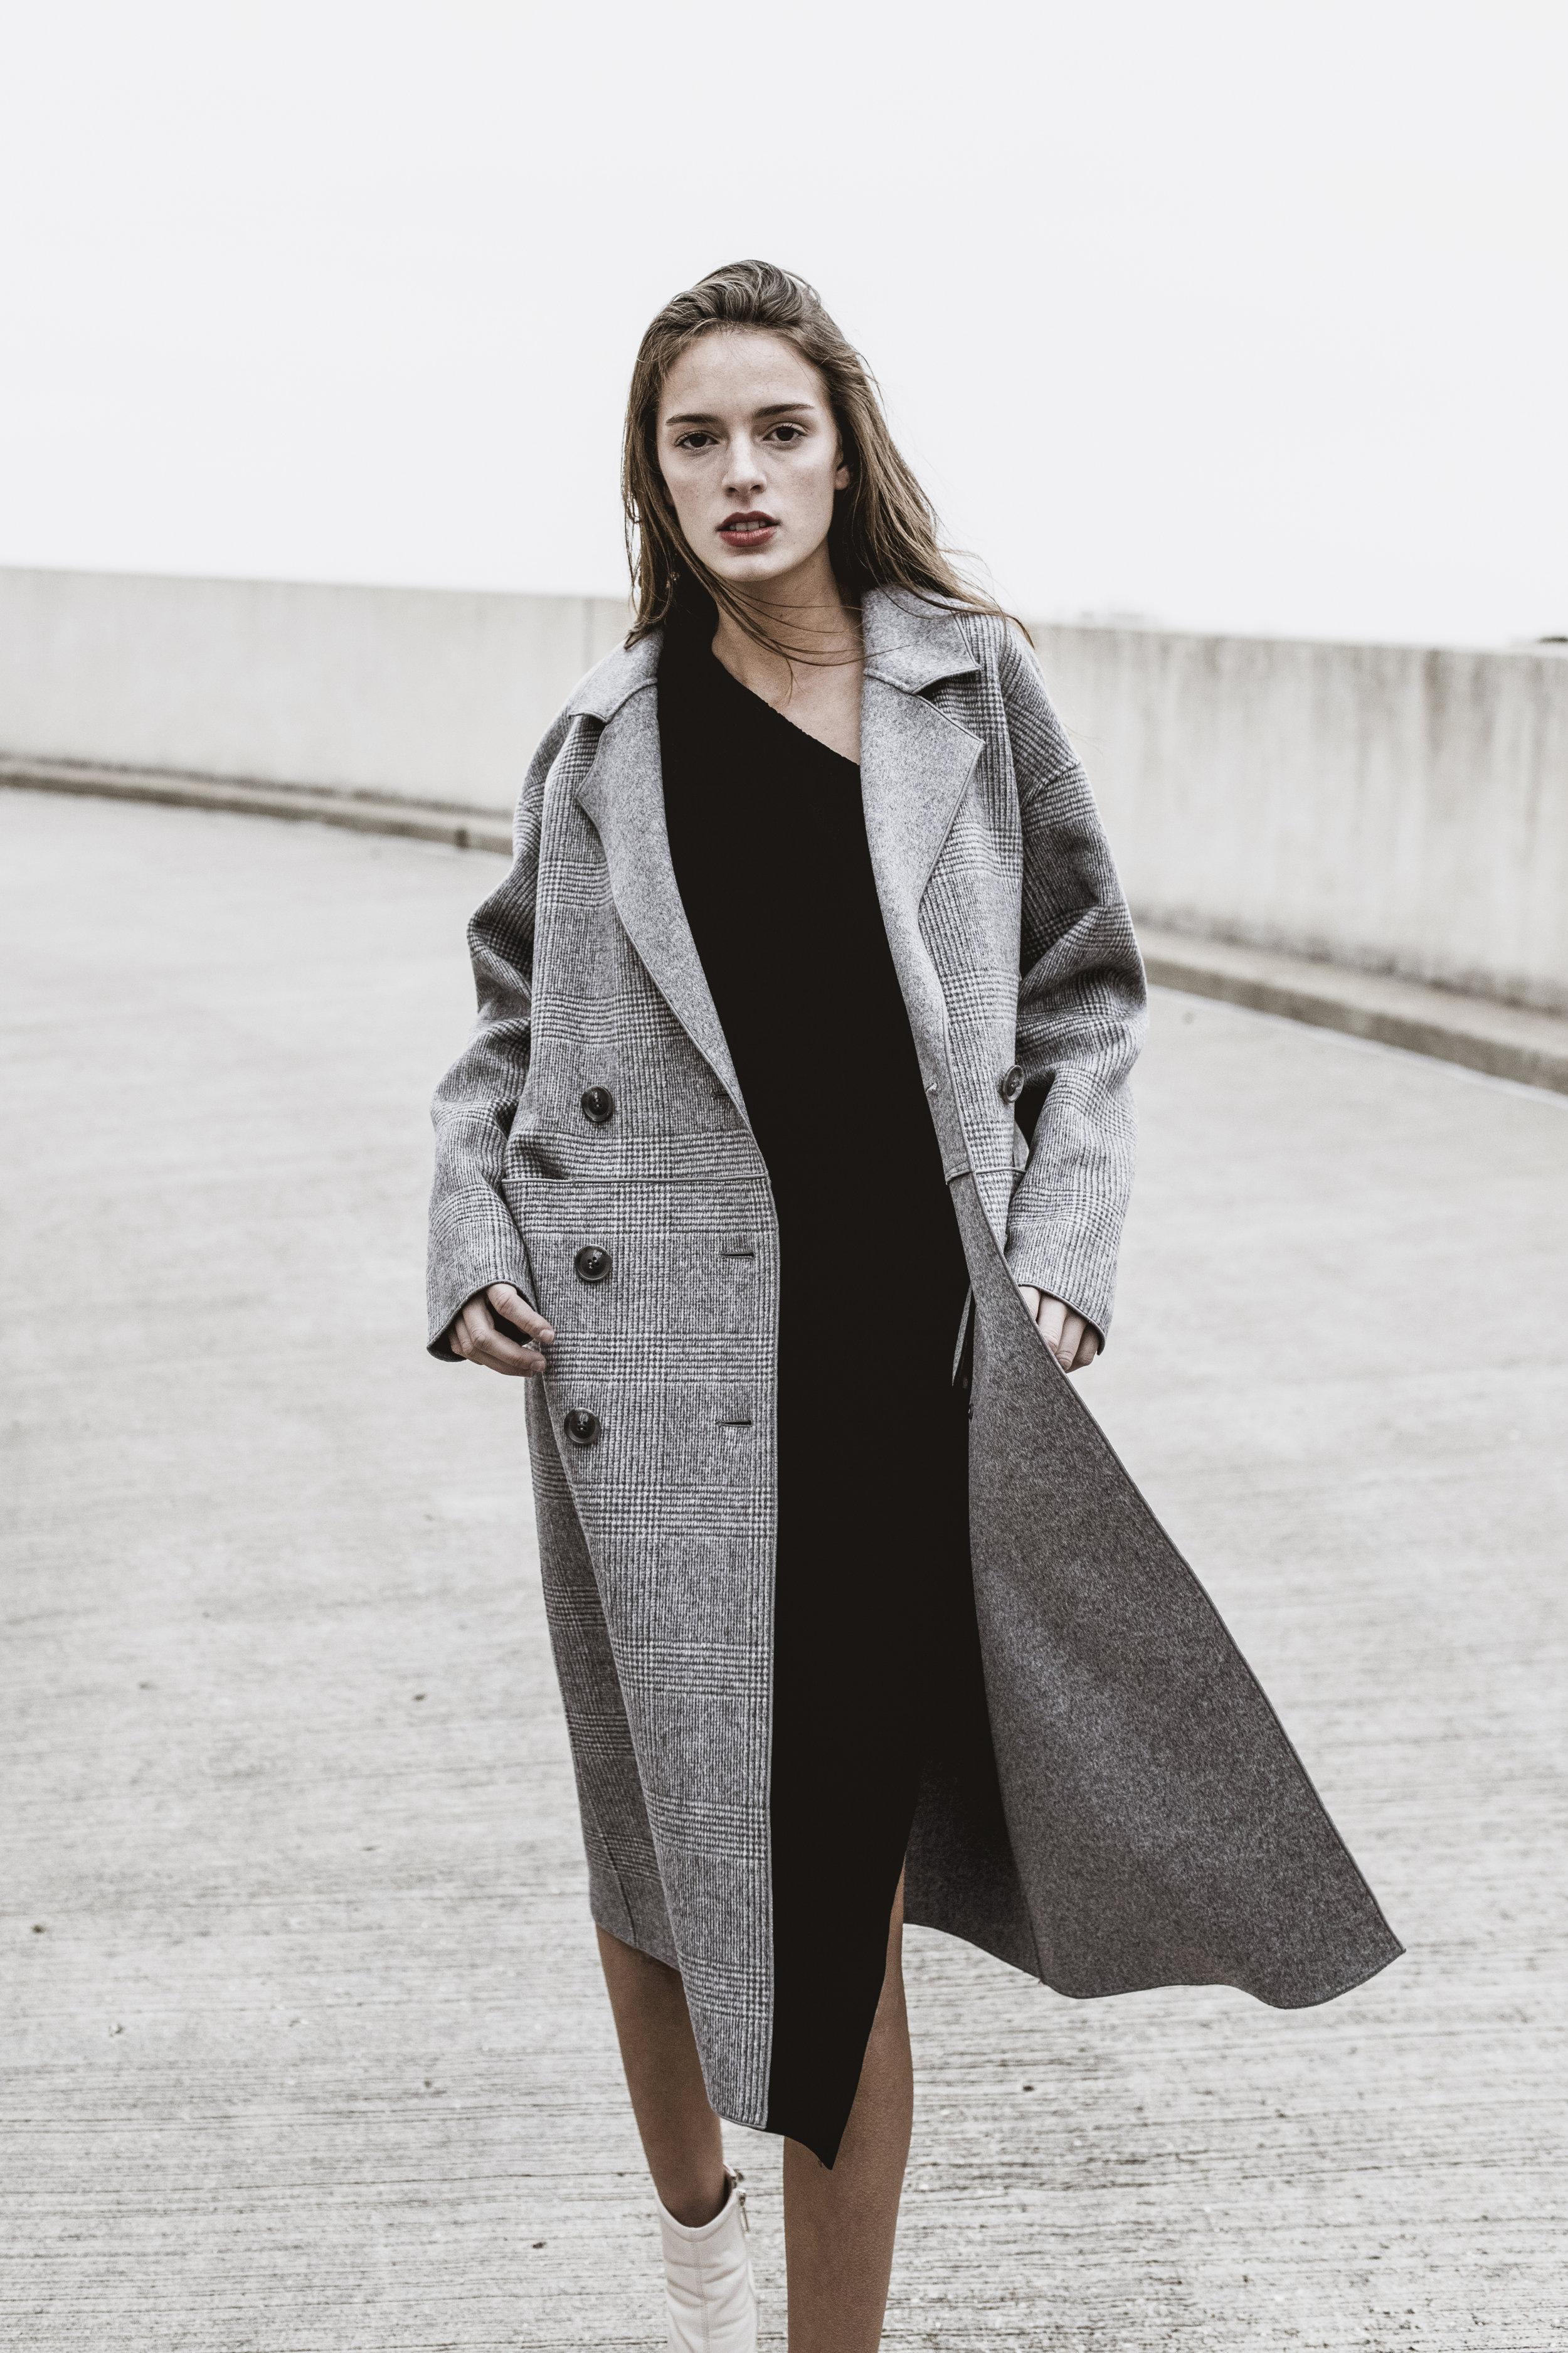 Studio Cossac  coat, Trina Turk coat via  Rent the Runway ,  SVDP Madison  boots